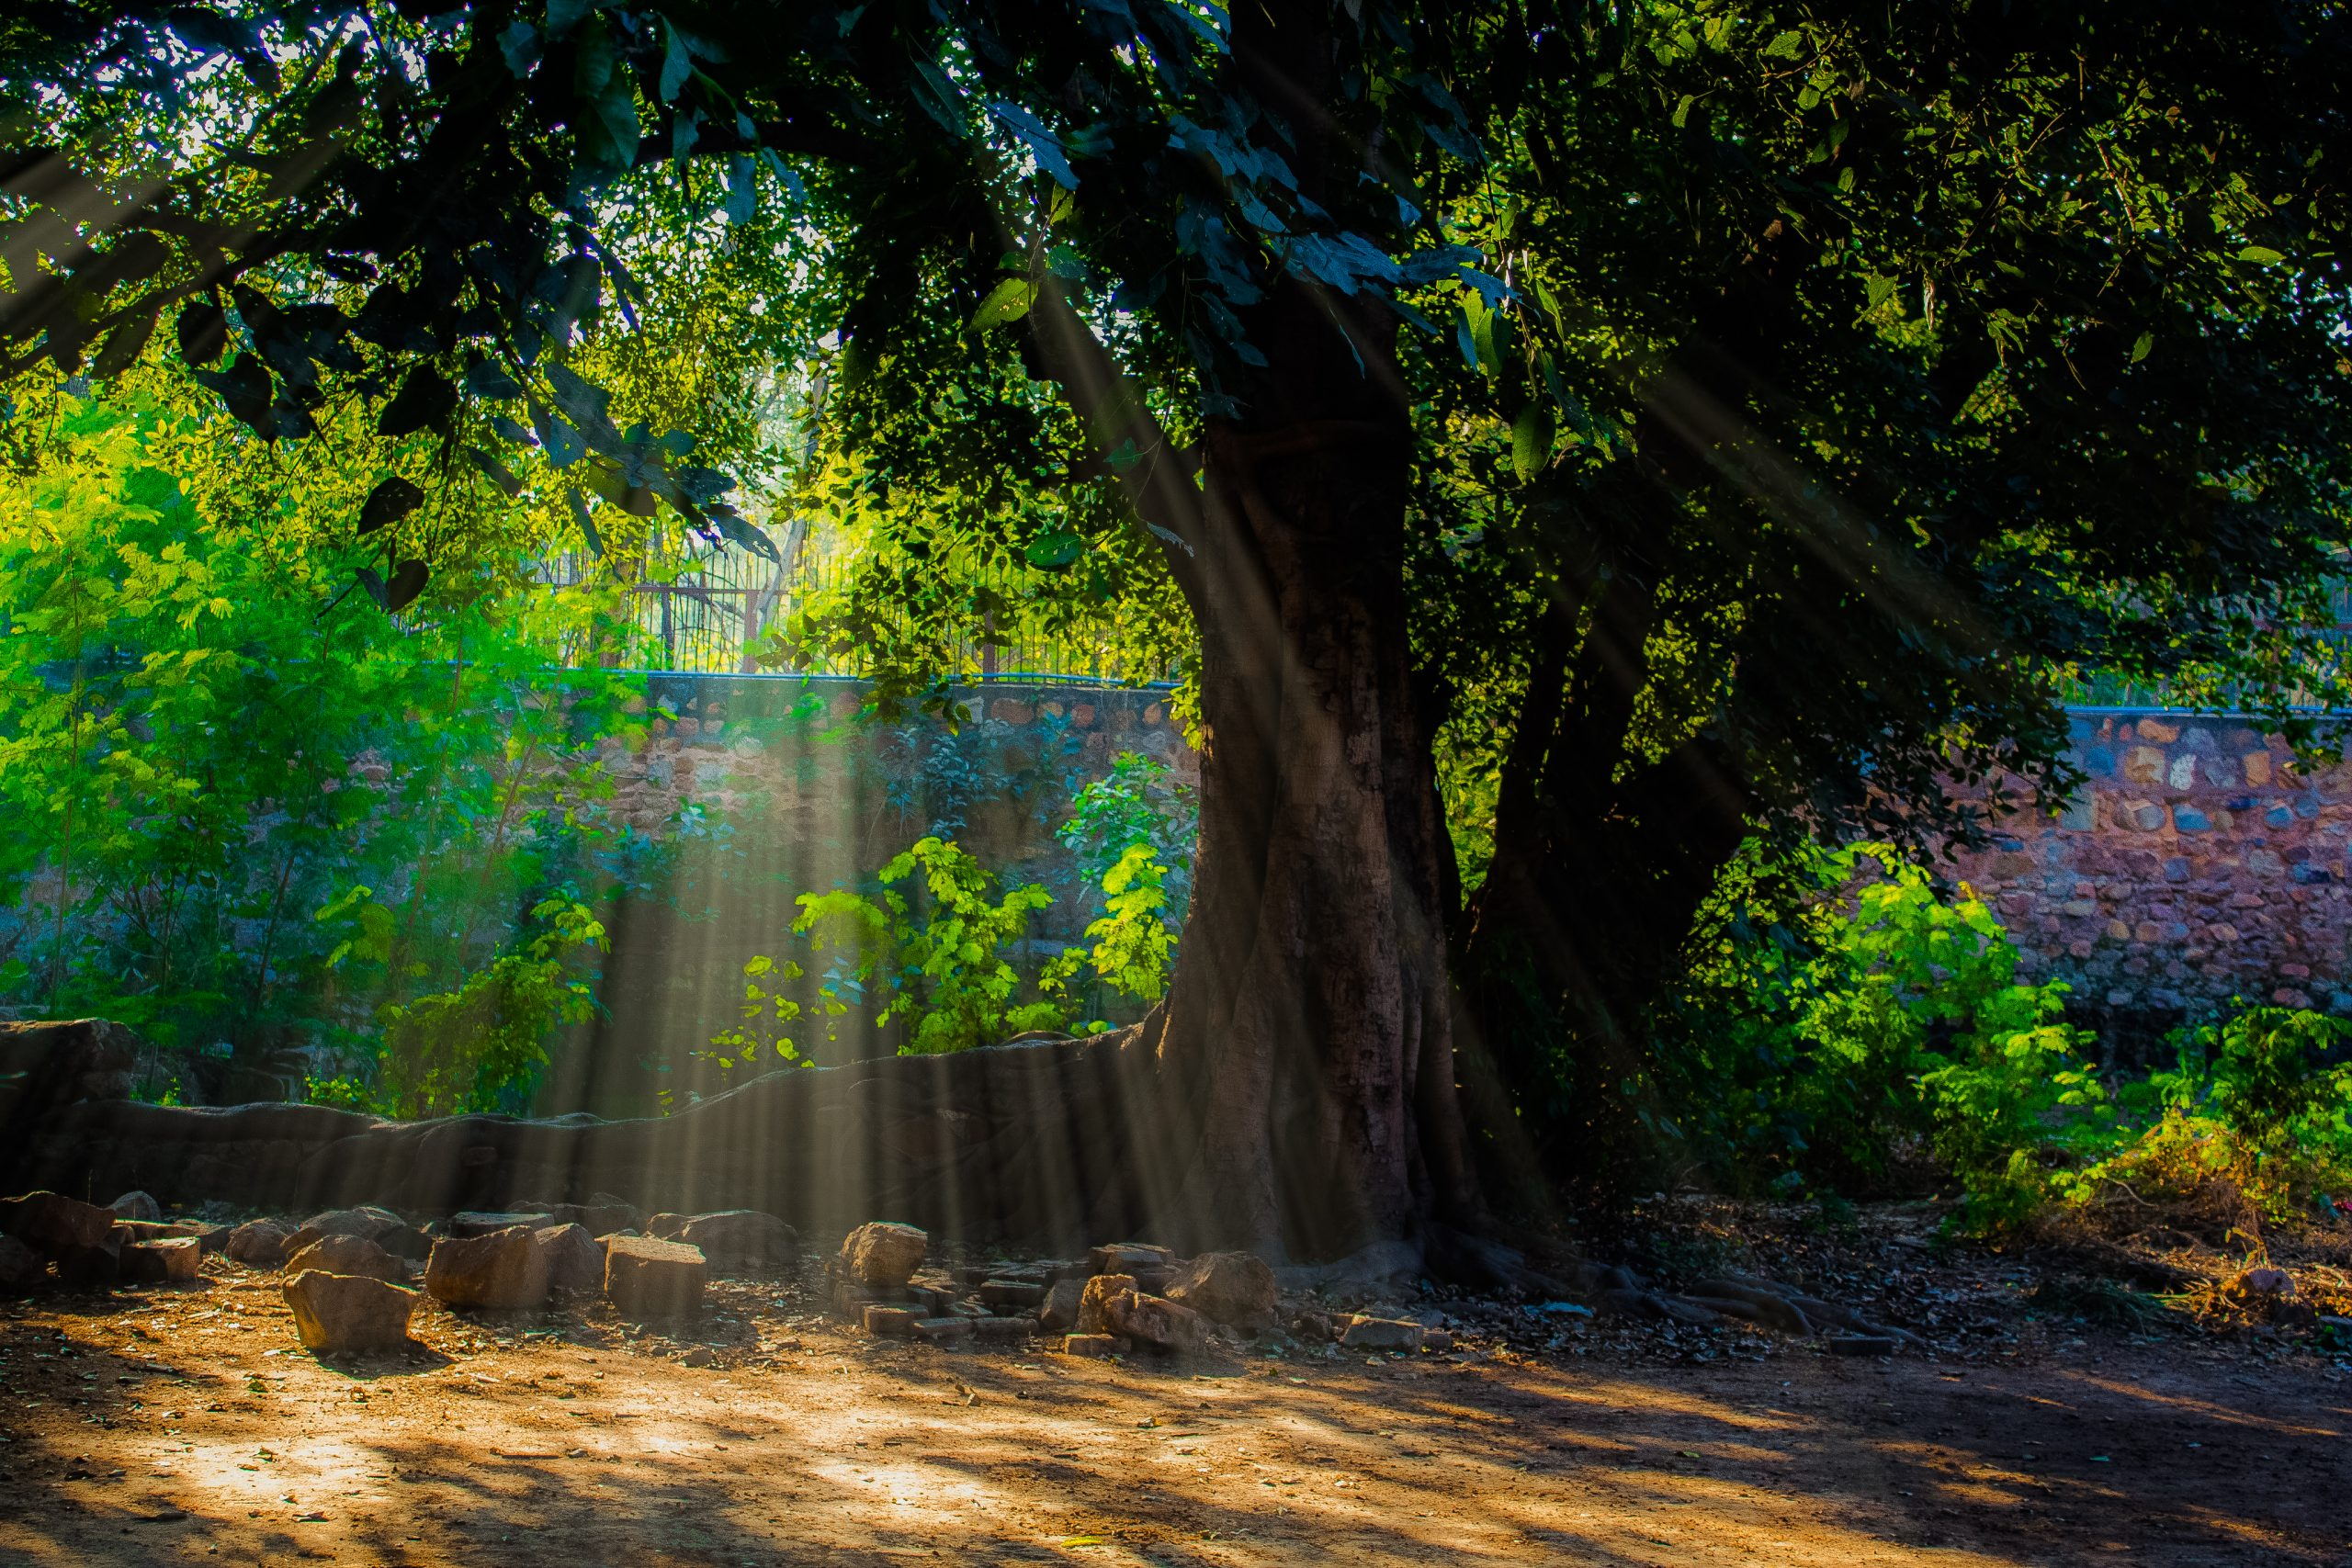 Sun light passing through a tree